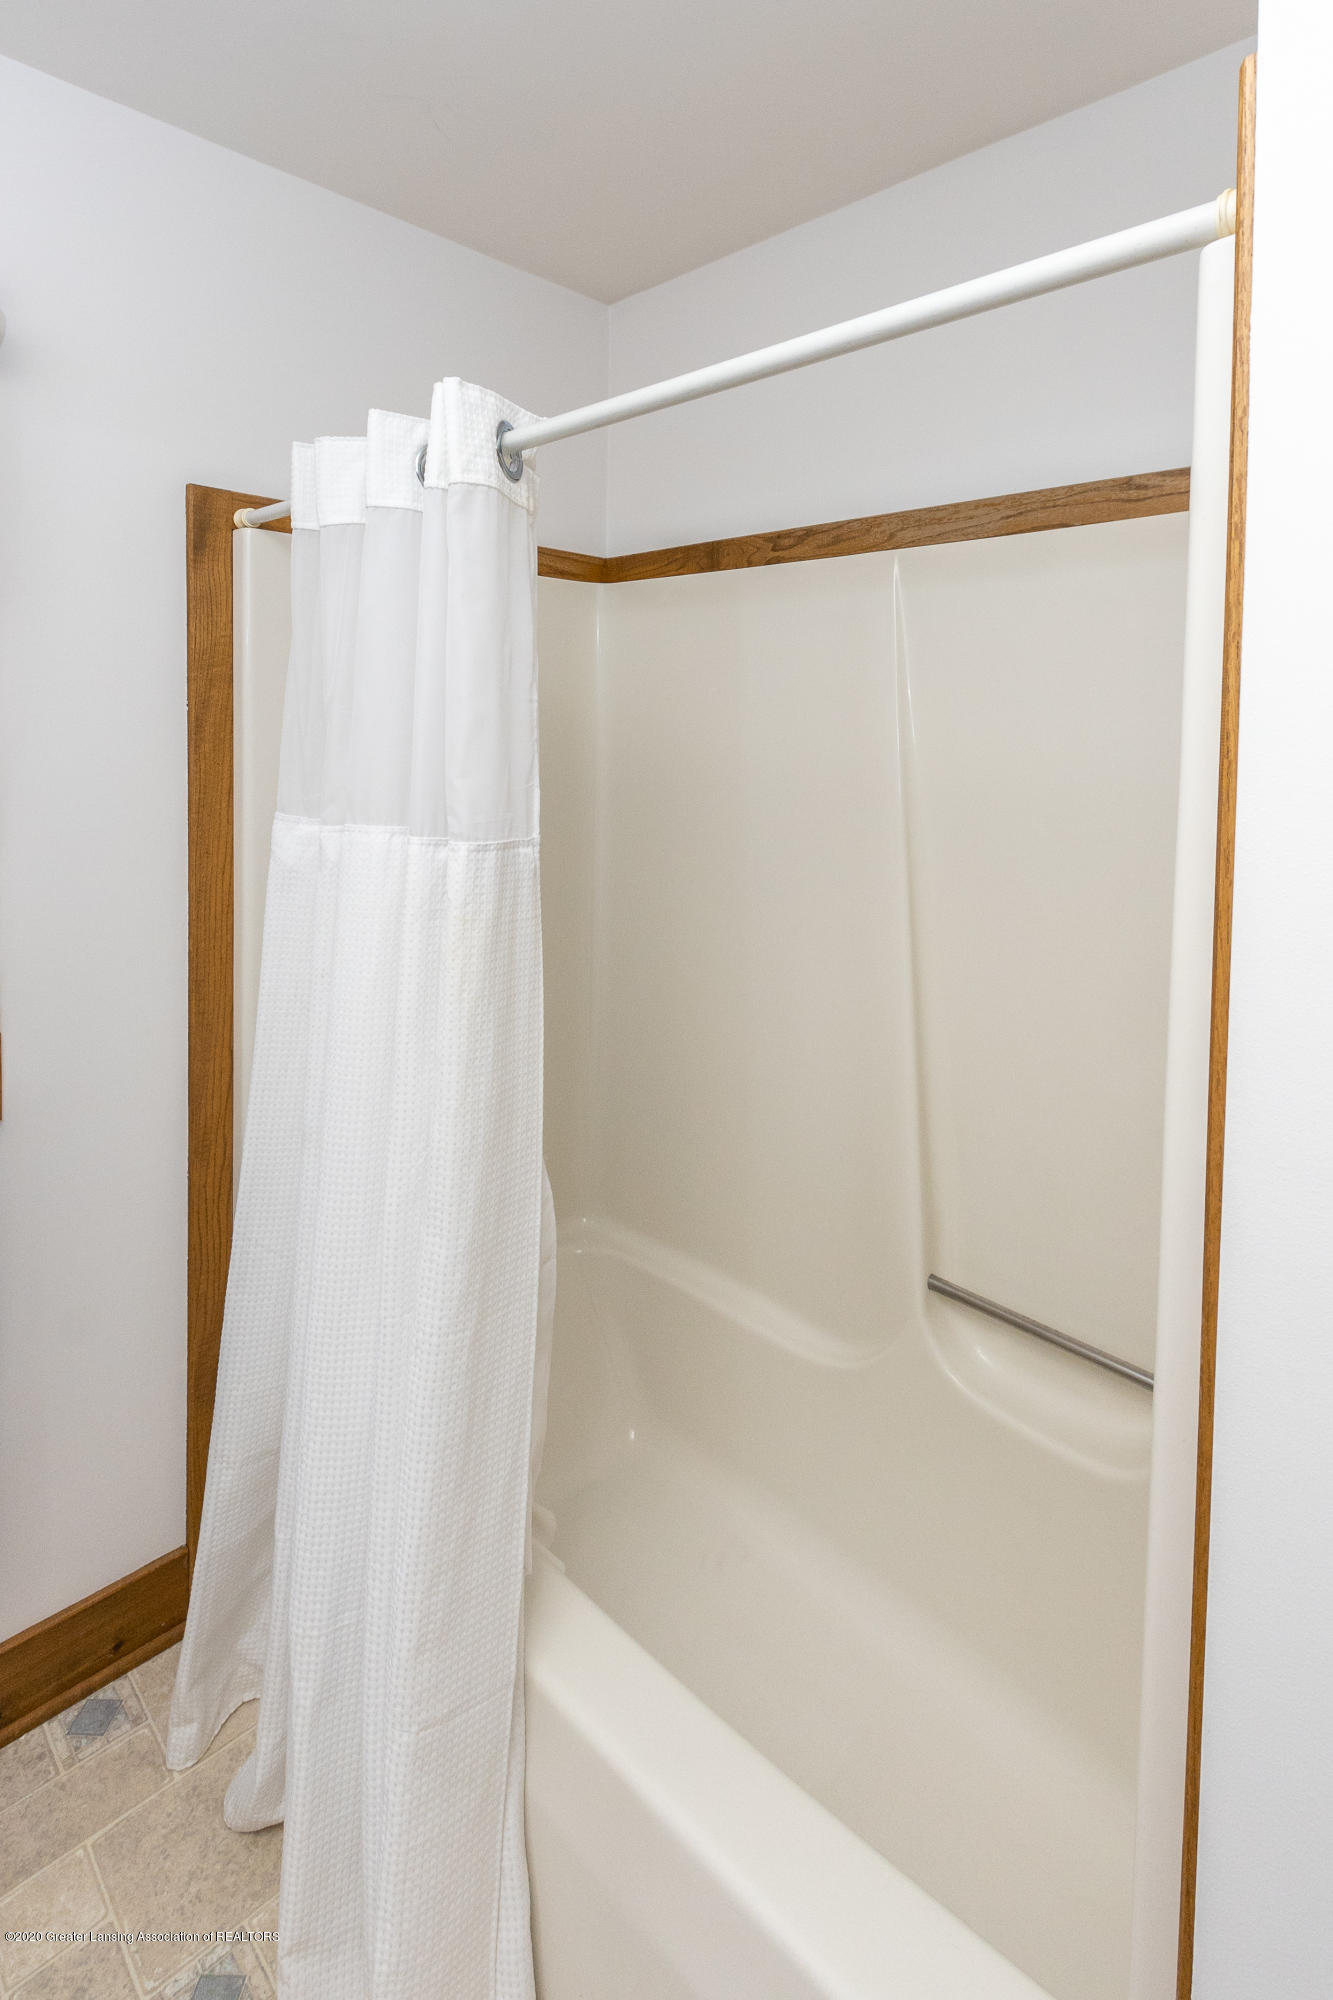 3945 Breckinridge Dr - First Floor Full Bathroom - 26